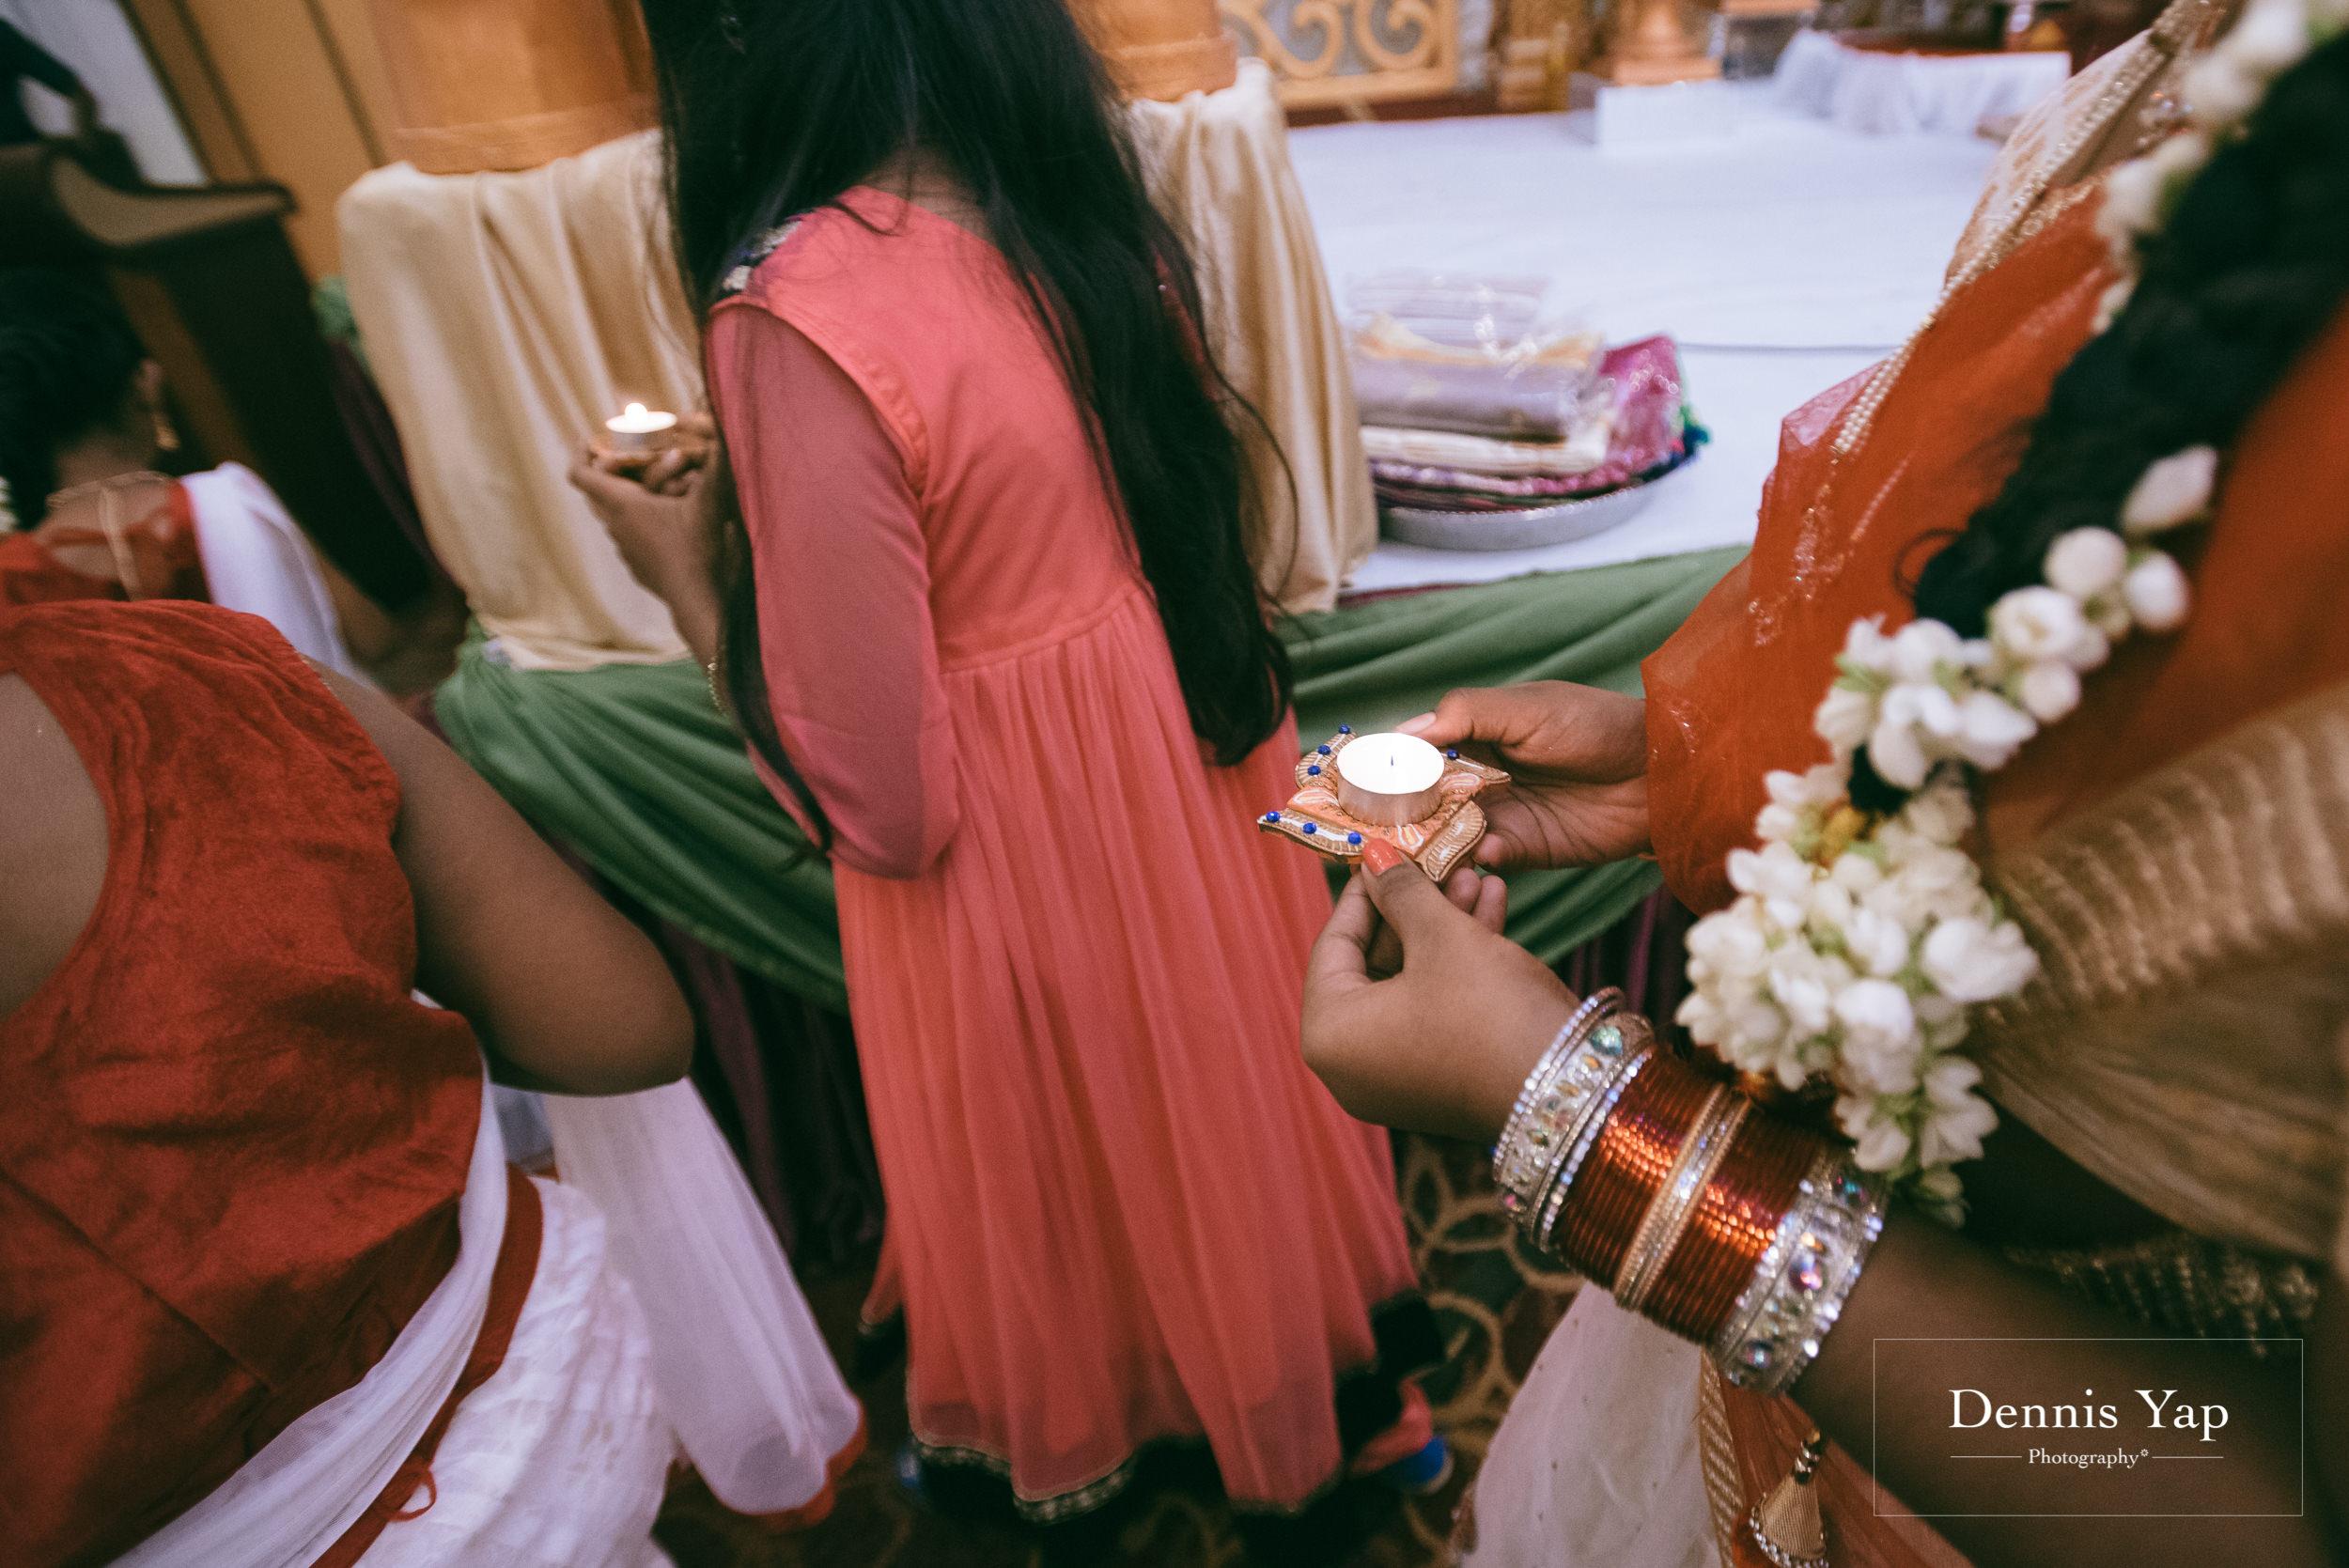 puvaneswaran cangitaa indian wedding ceremony ideal convention dennis yap photography malaysia-8.jpg